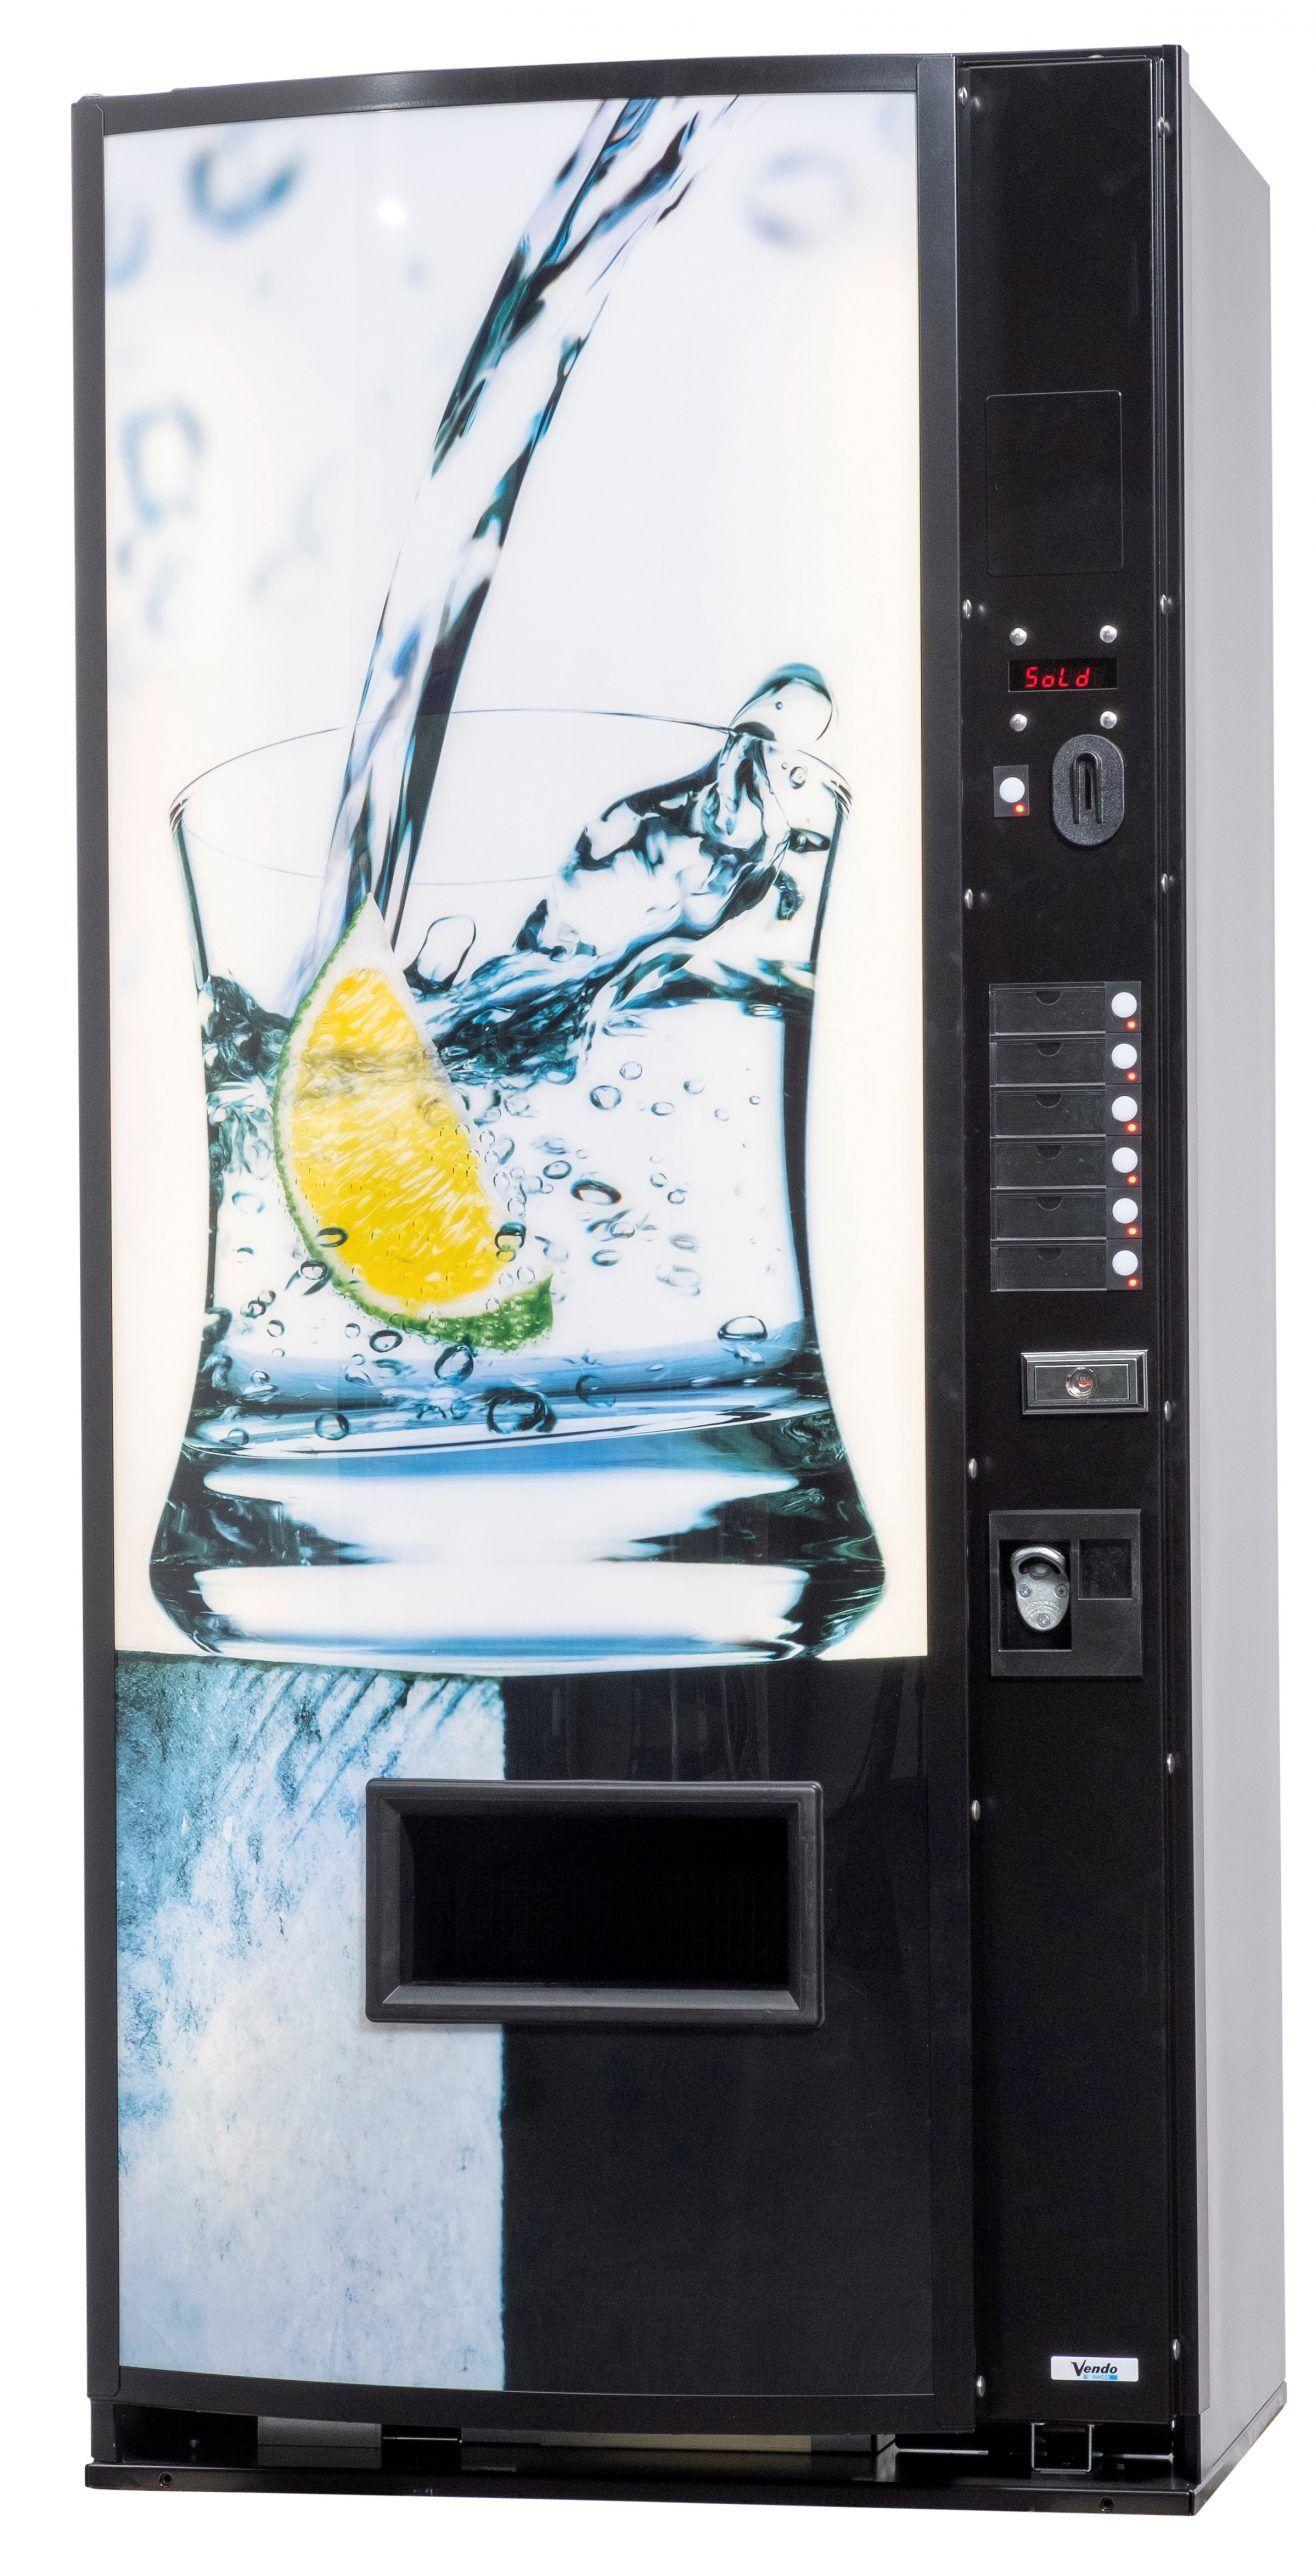 Vendo Frisdrankenautomaat